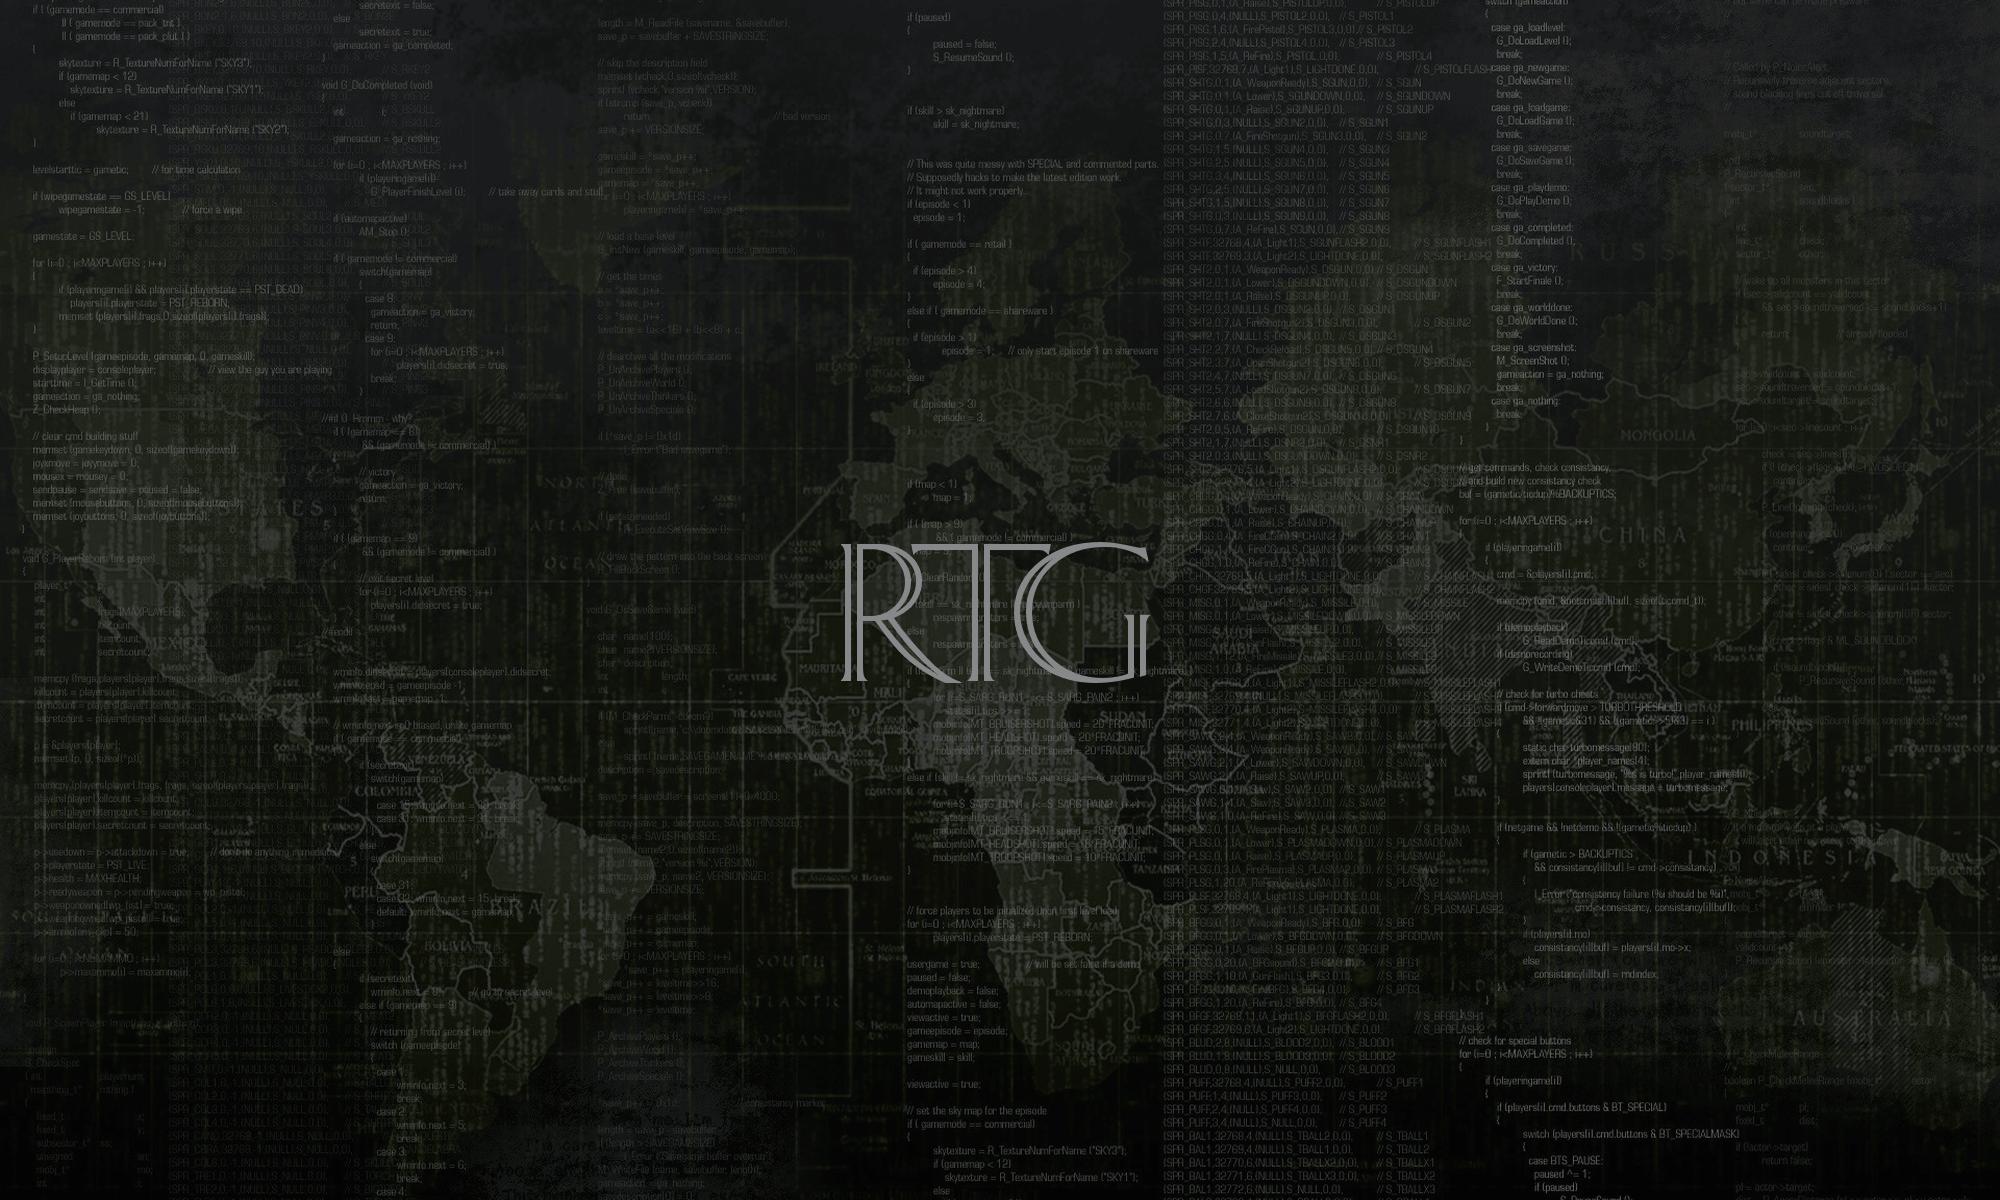 RTG LLC